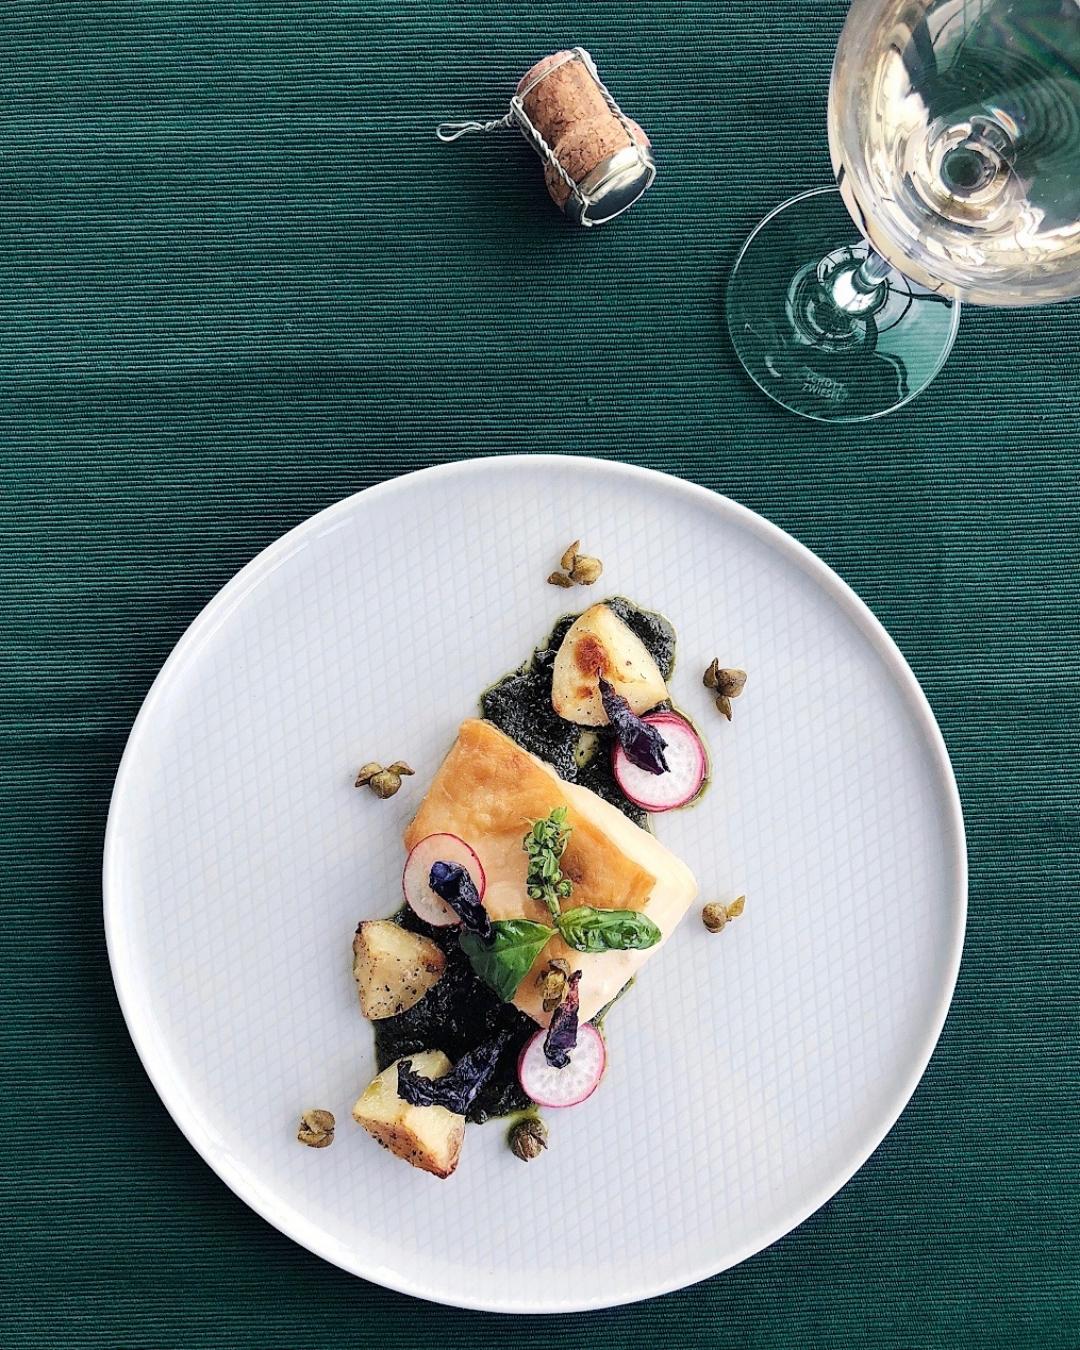 Butter Fish from Tropique Café & Restaurant